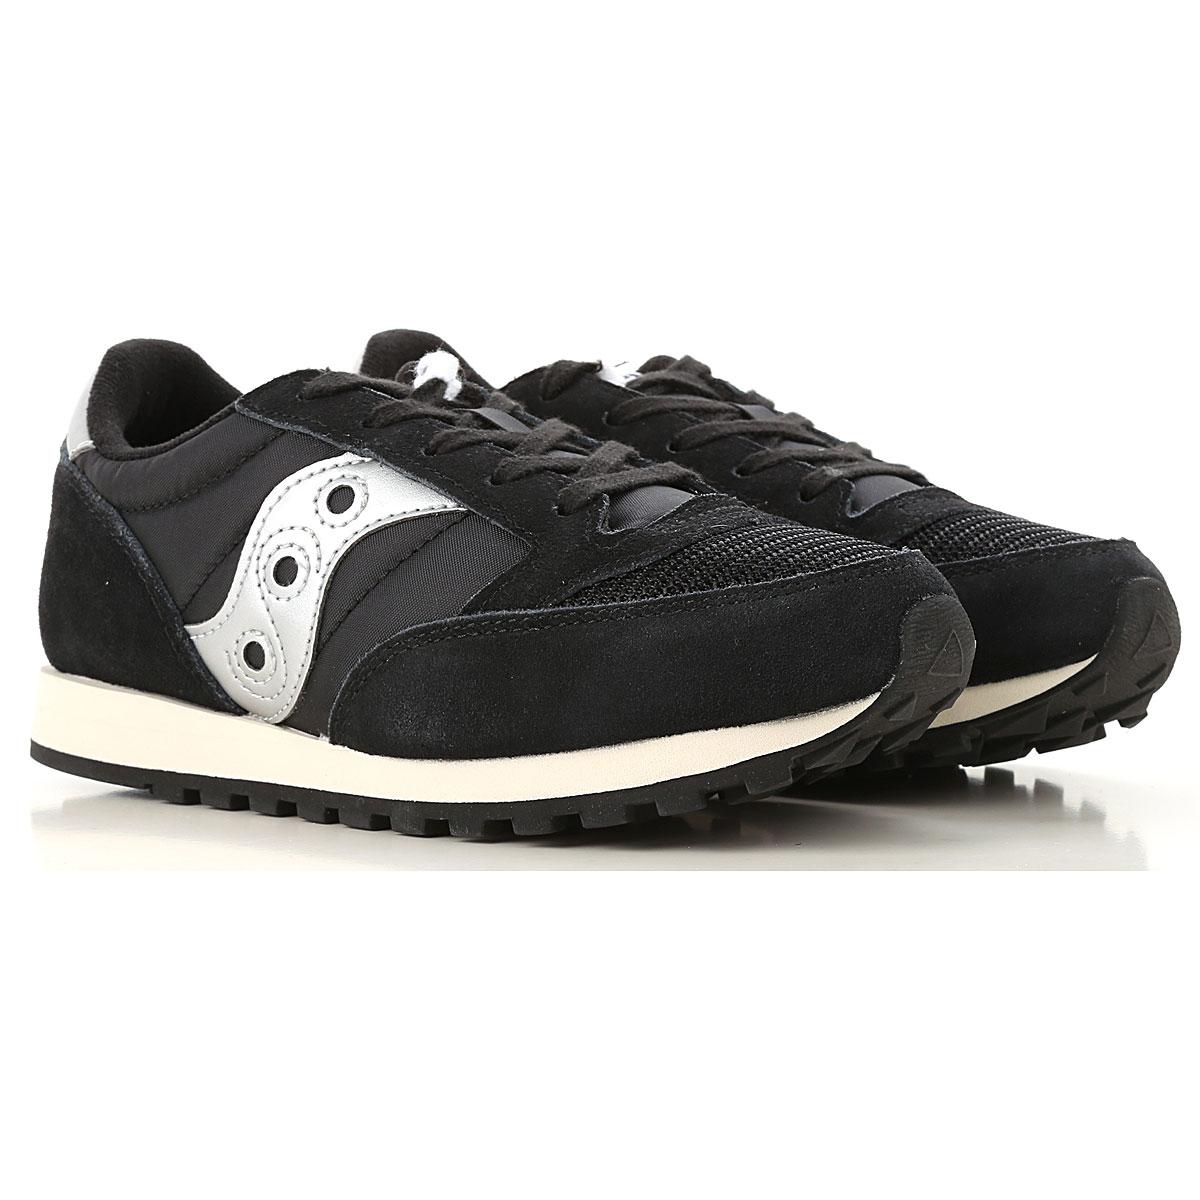 Image of Saucony Kids Shoes for Girls, Black, Suede leather, 2017, Toddler 10.5 - Ita 27 UK 10.5 - EUR 28 Toddler 12 - Ita 29 Toddler 13 - Ita 31 UK 12 - EUR 30 UK 13.5 - EUR 32 Child 2 - Ita 33.5 Child 3 - Ita 35